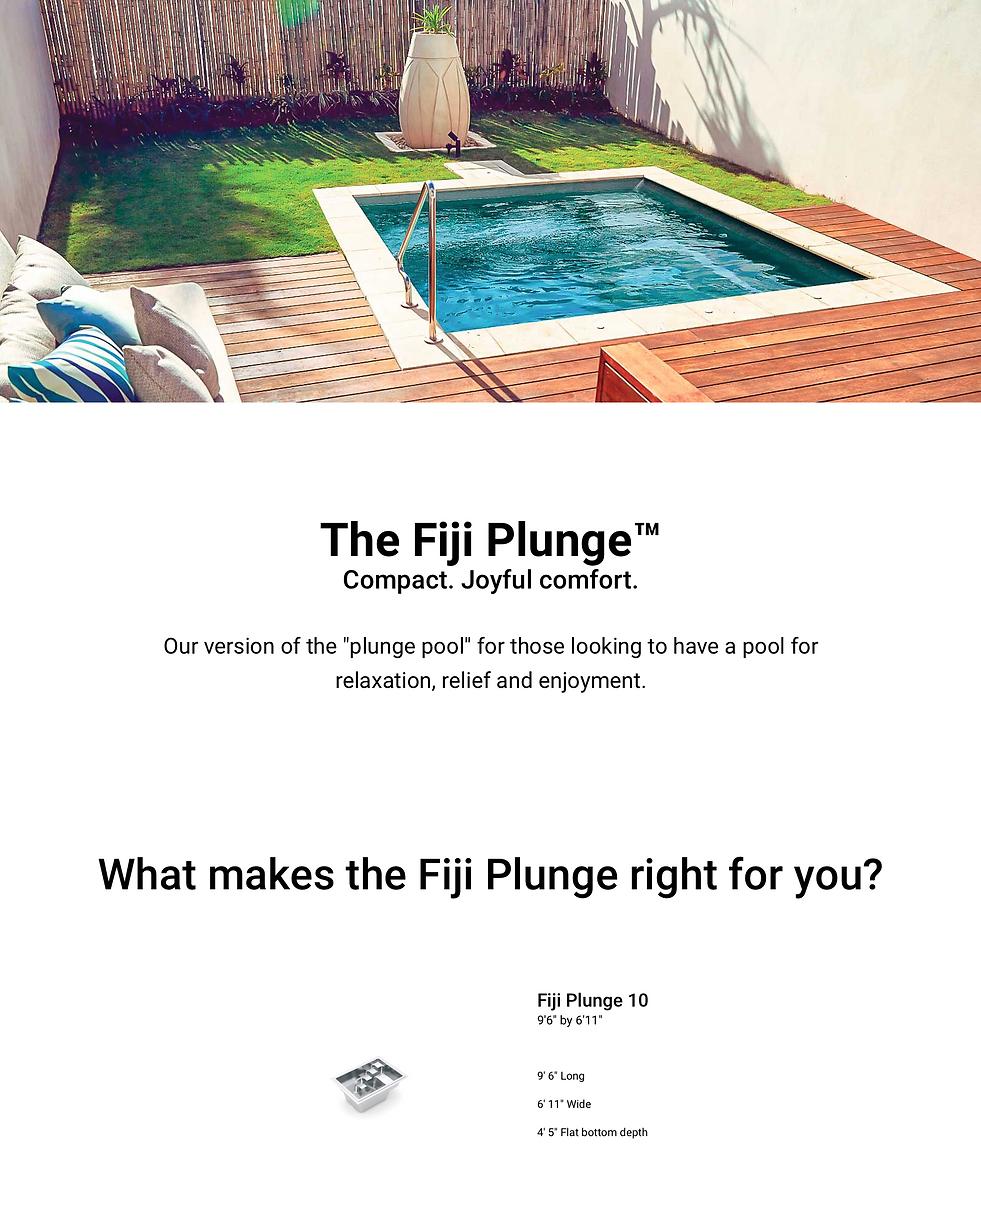 The Fiji Plunge Design.png